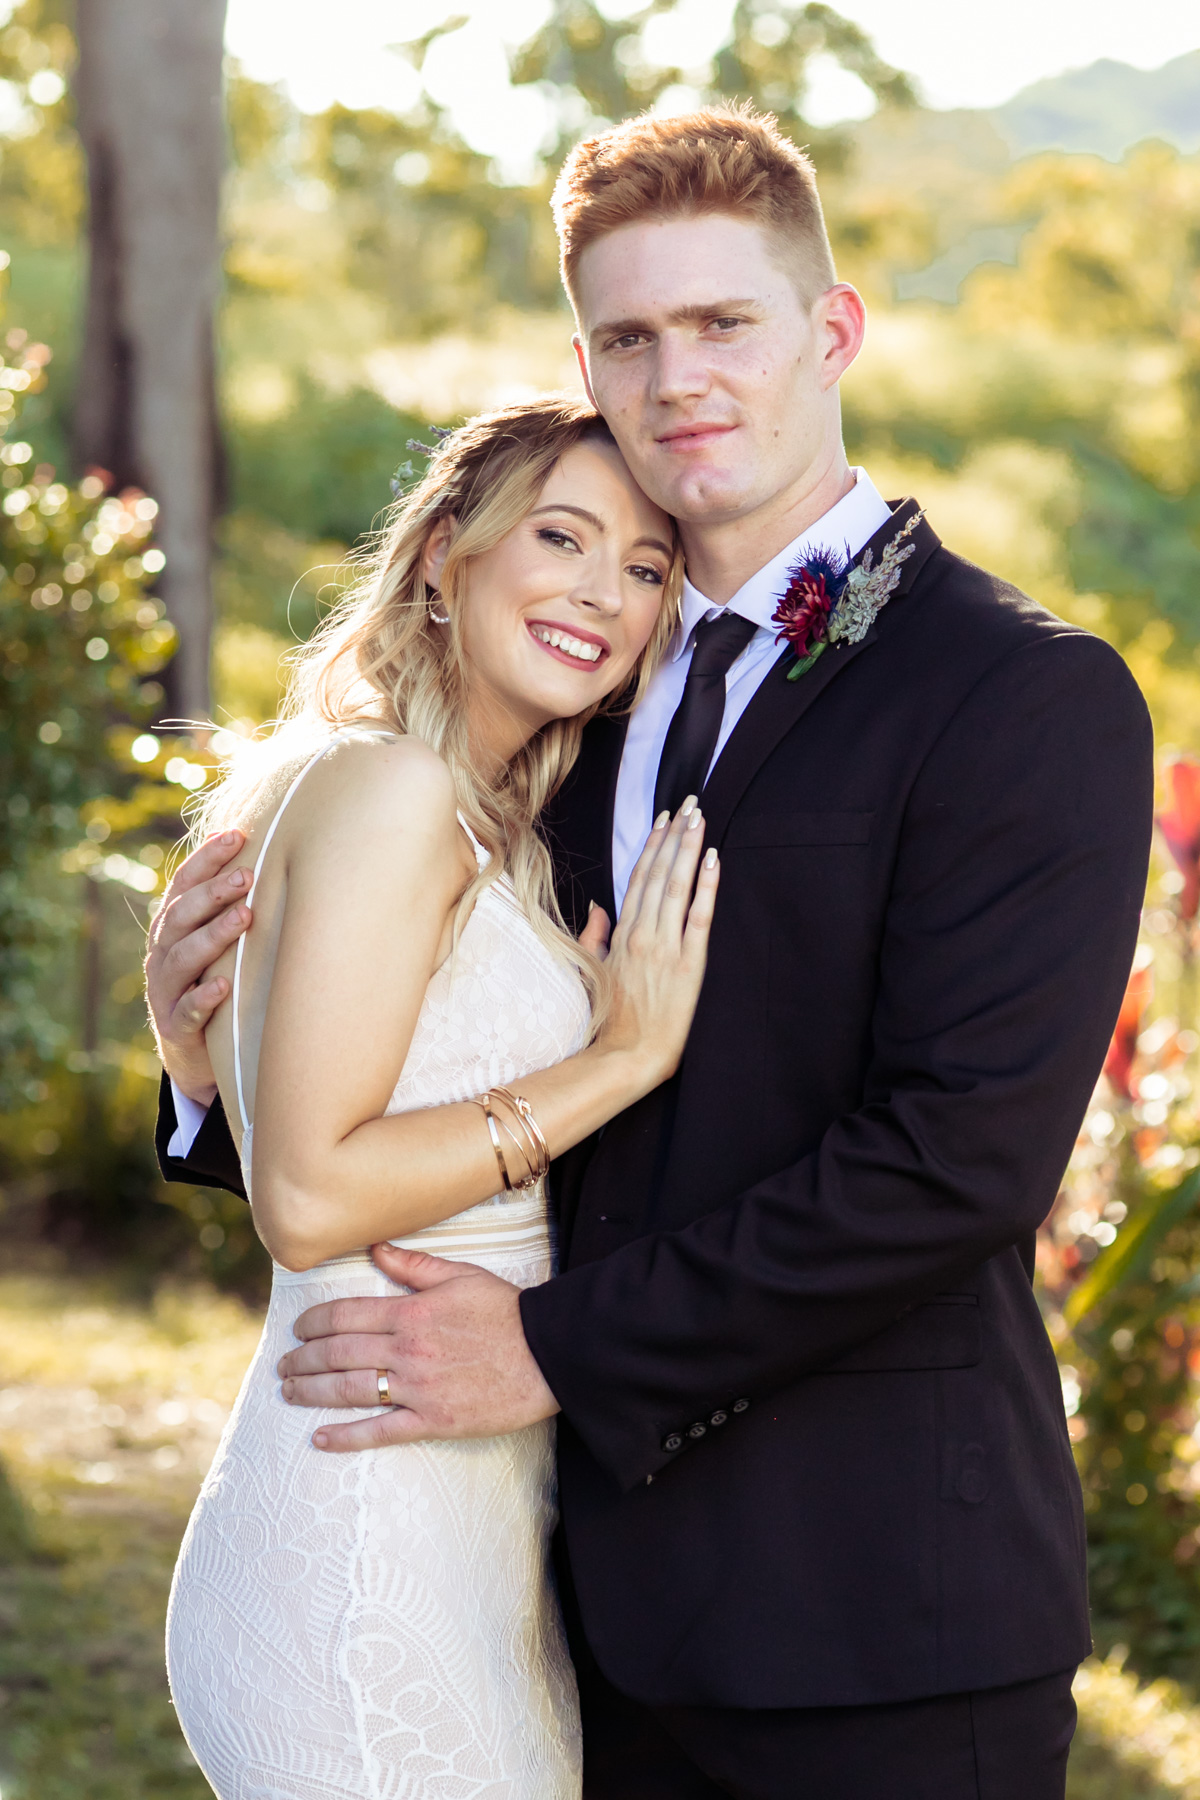 Weddings Cherry Photography Brisbane_-2.